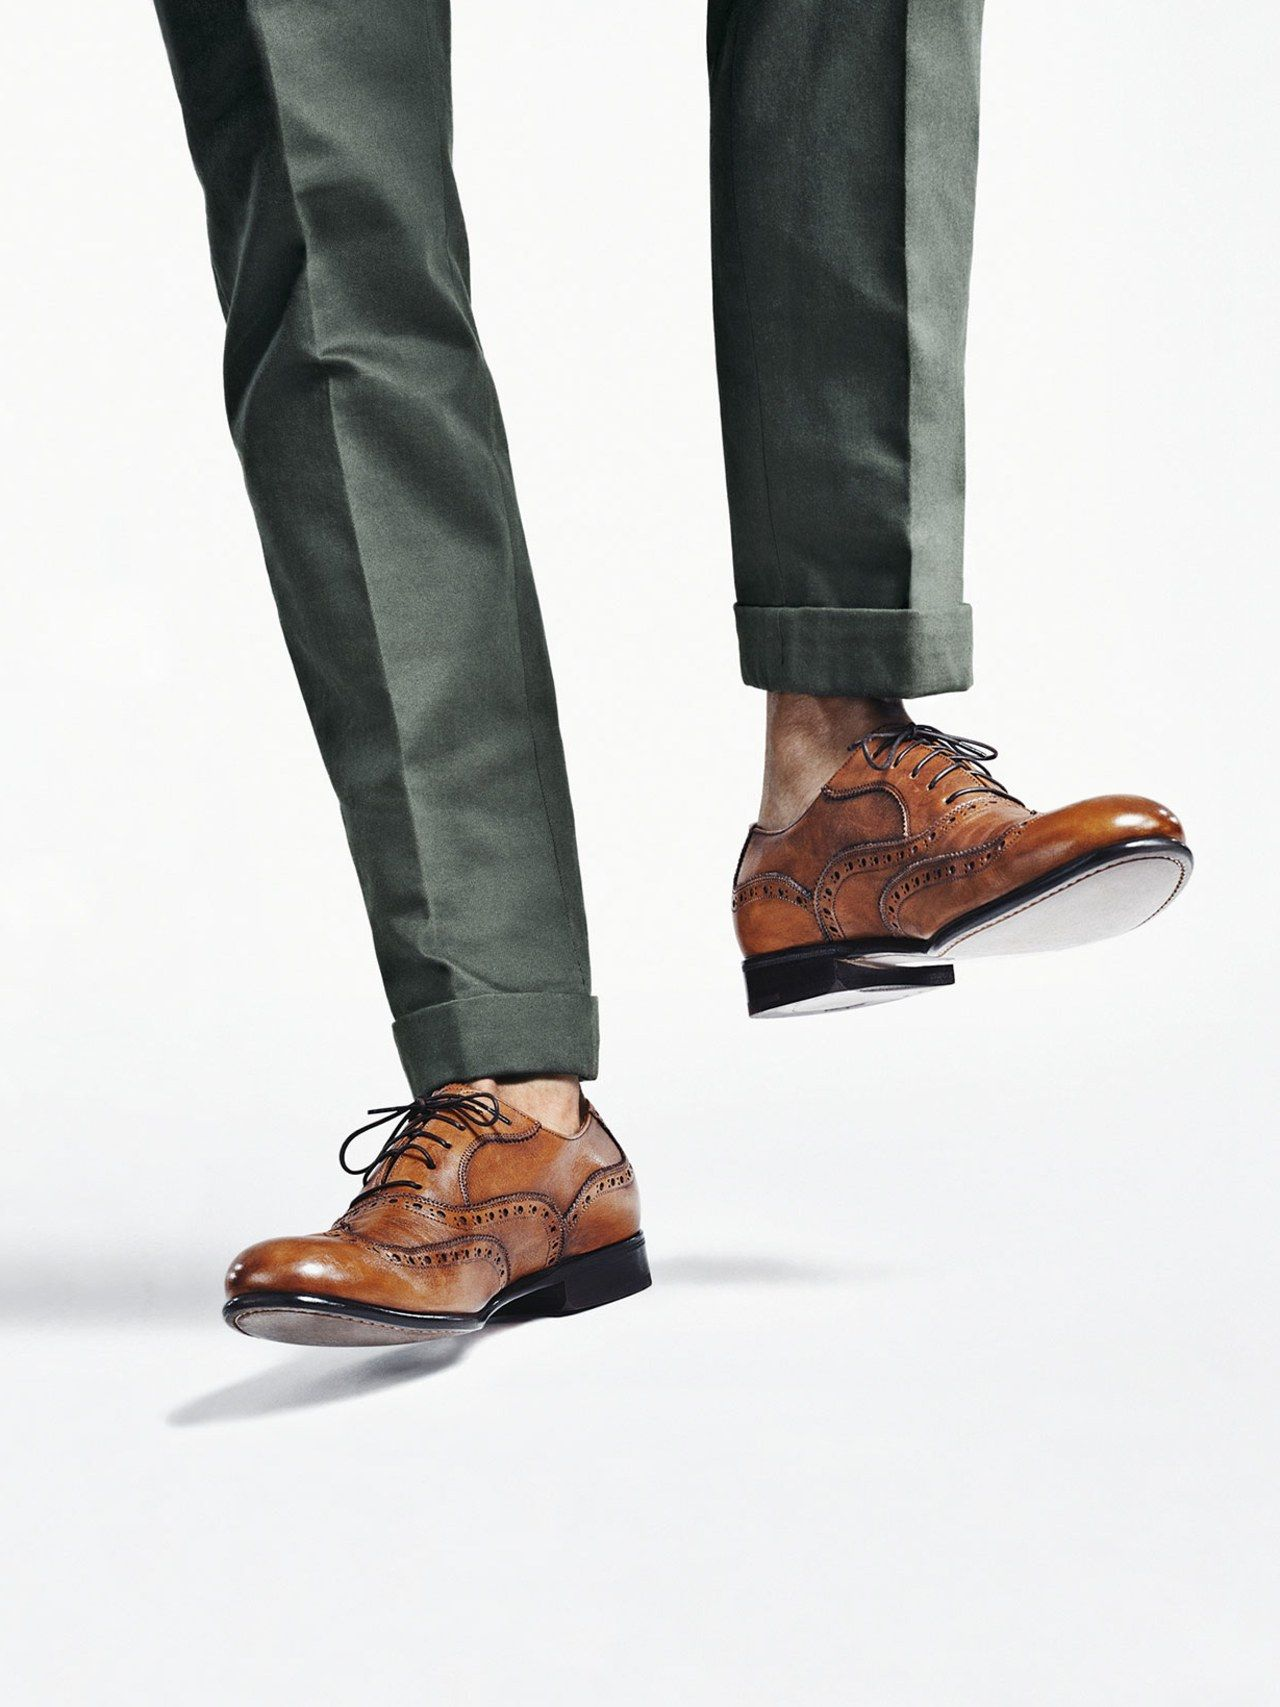 da6fb594de7 GQ recommends these superior no show socks (a.k.a. invisible socks